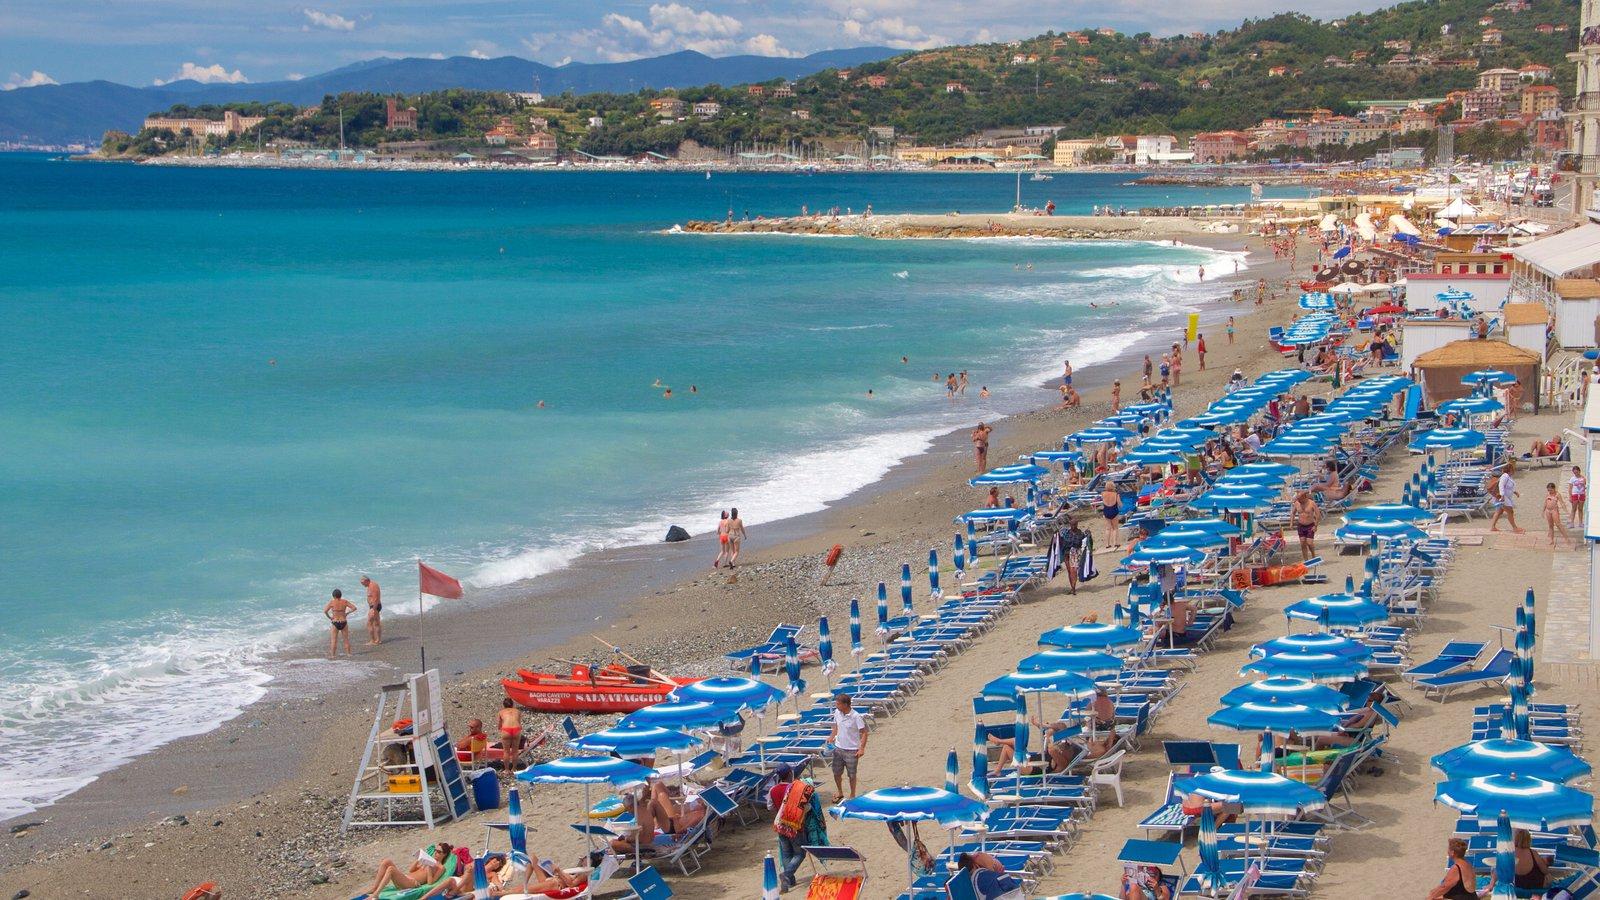 slider-image-https://amarettivirginia.testavendre.se/image/1367/99369-Liguria.jpg